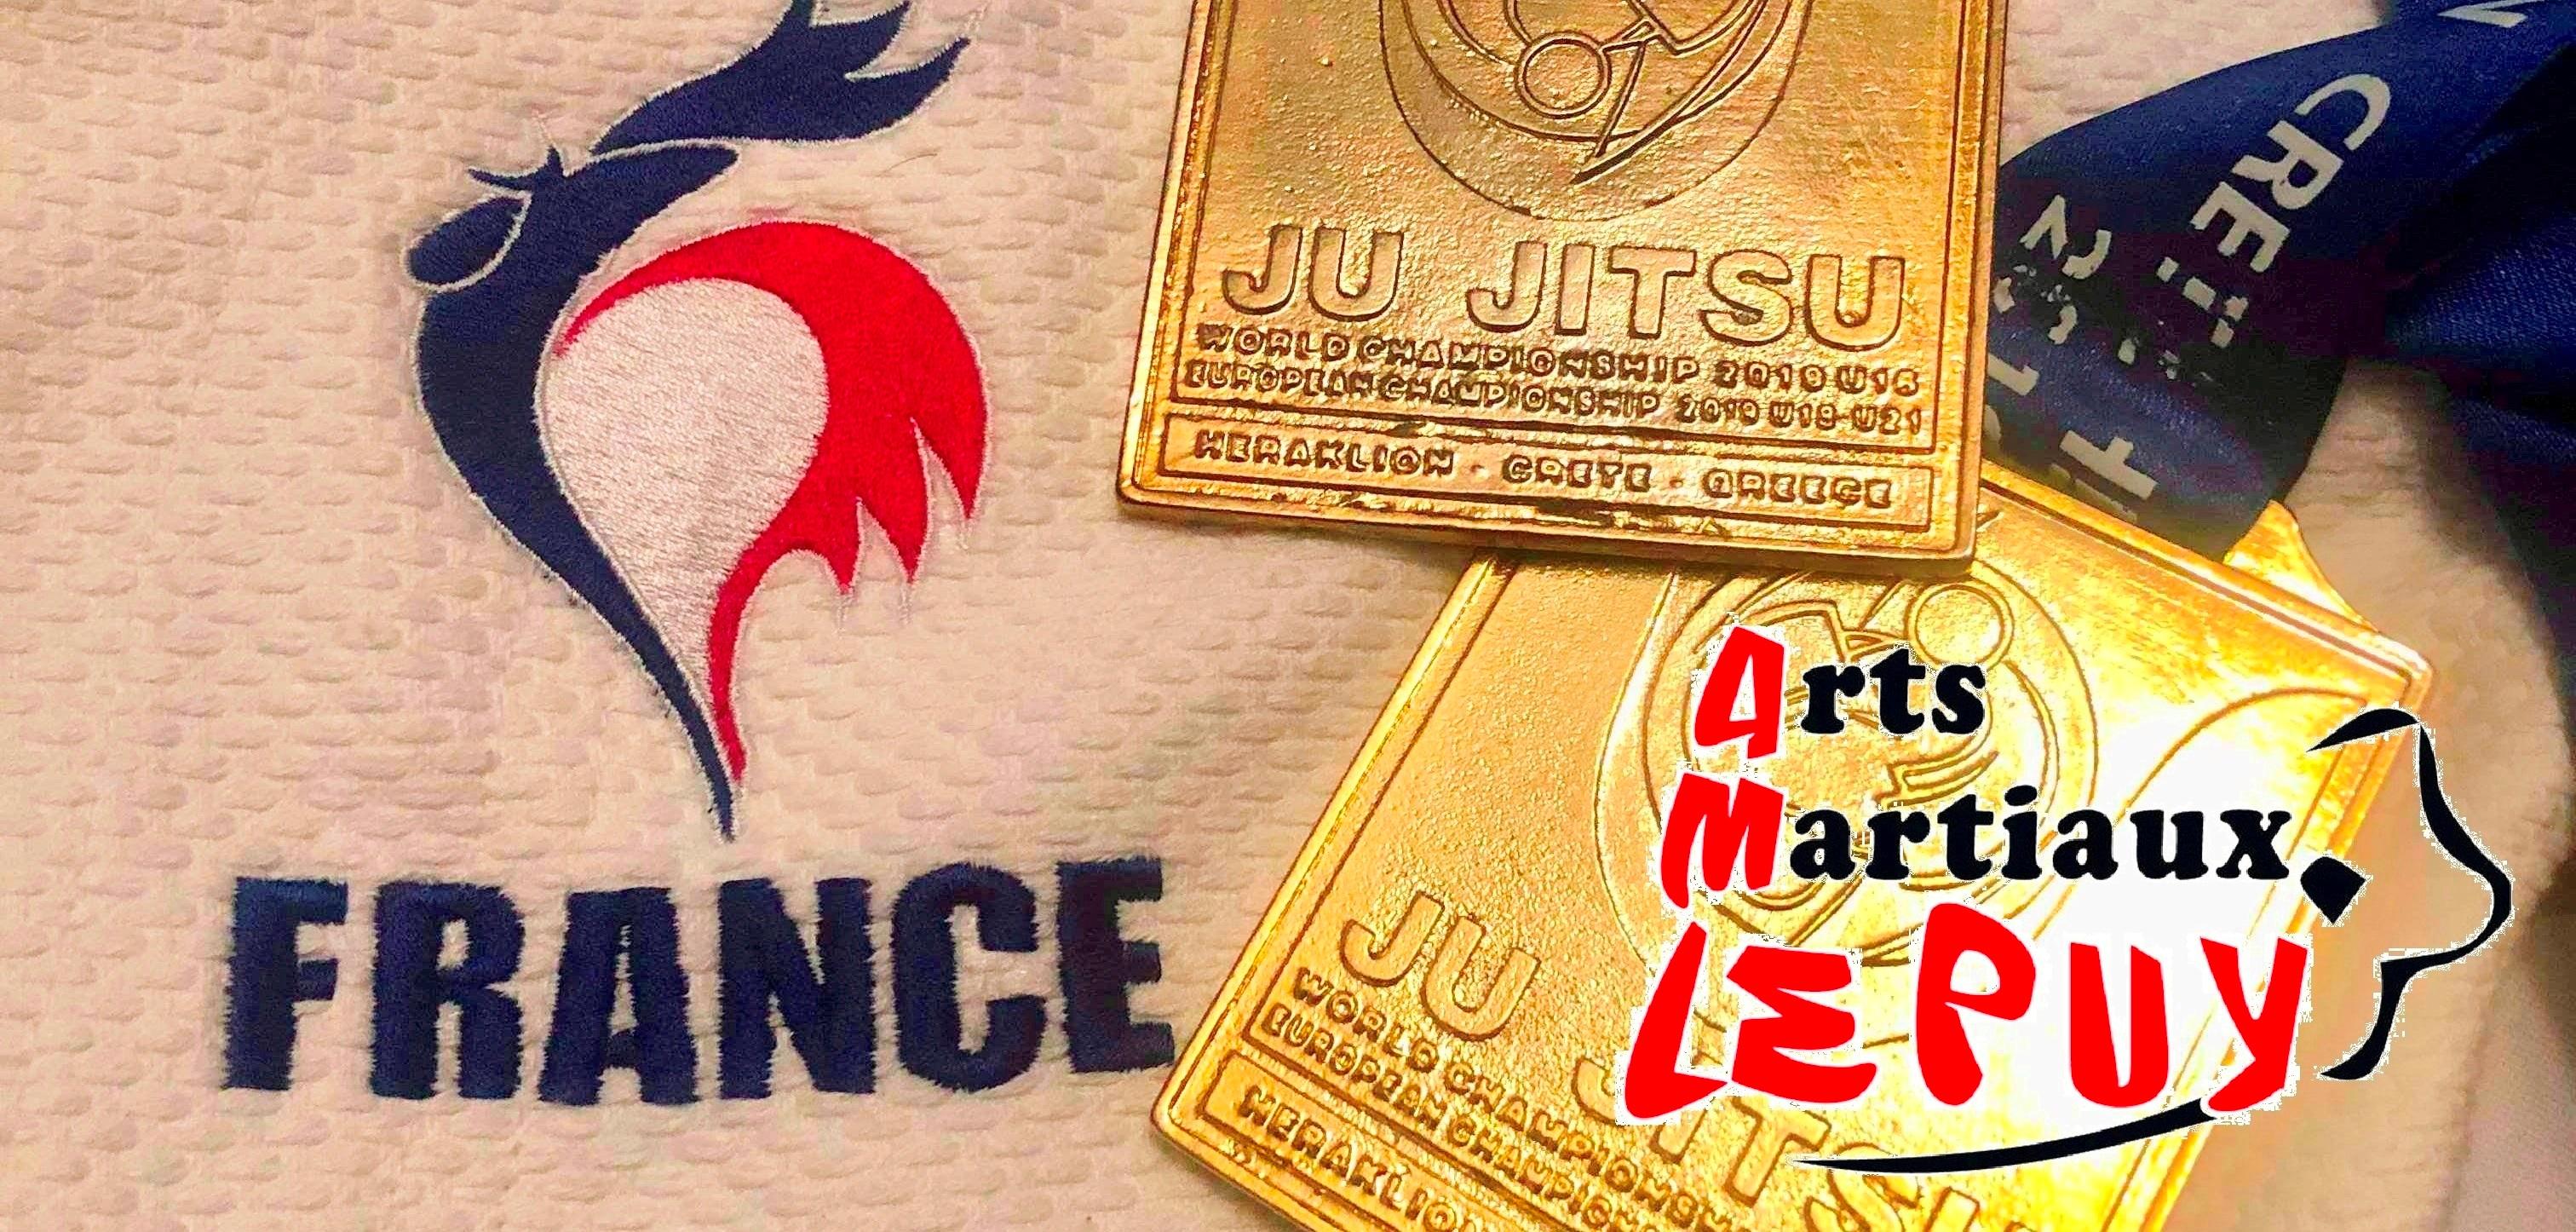 Champions d'Europe Jujitsu !